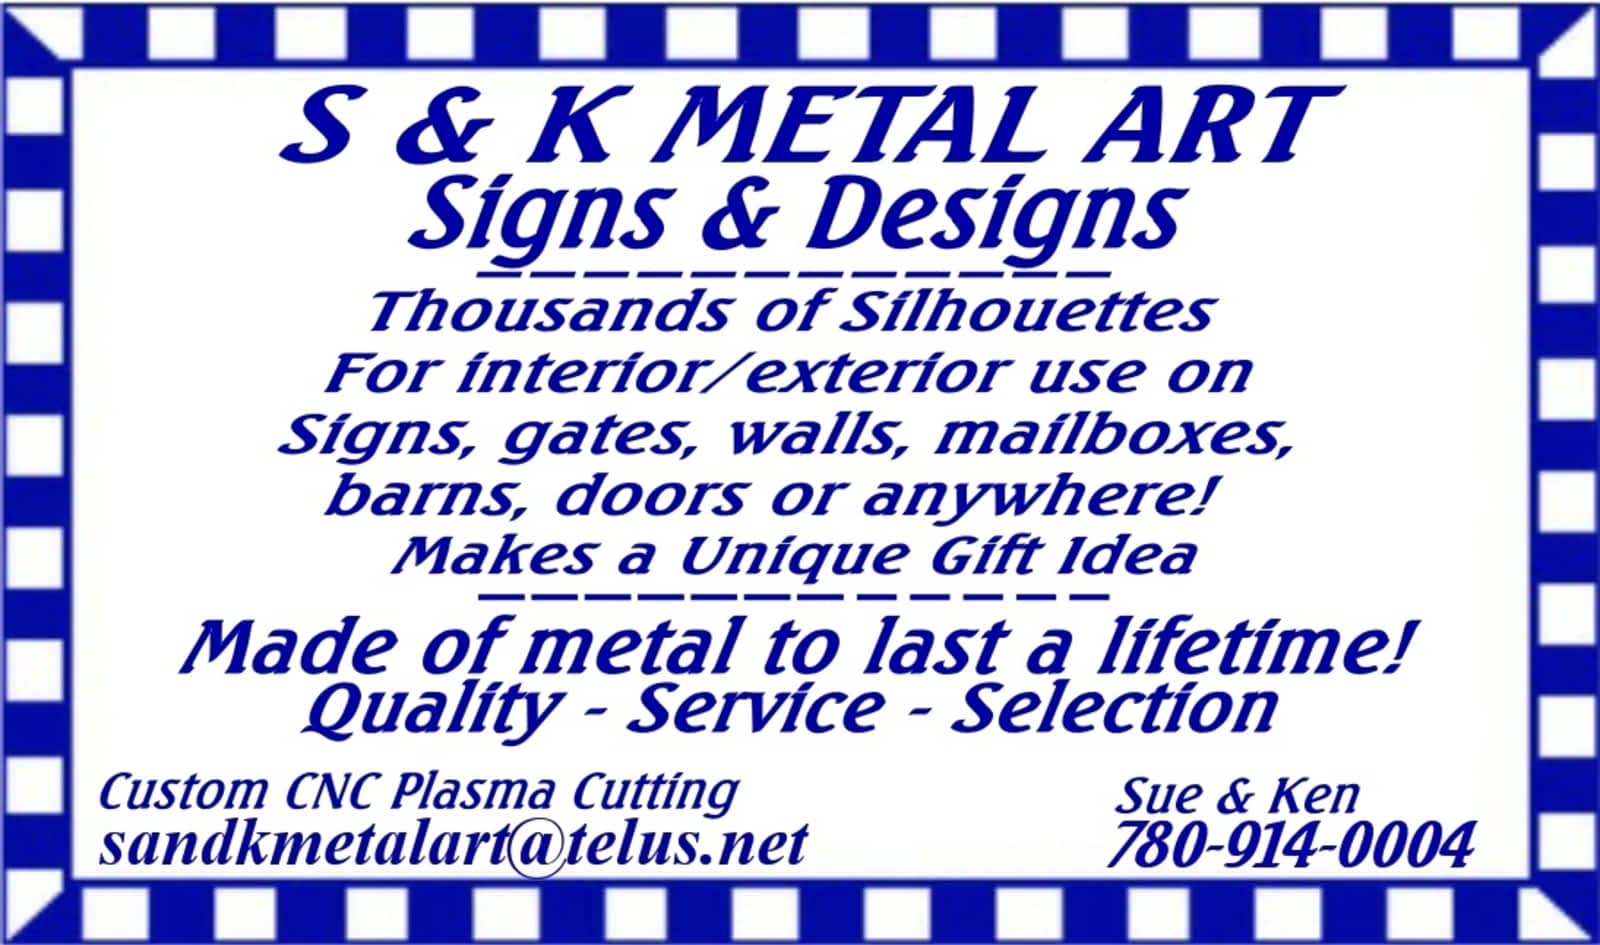 S&K MetalArt - Opening Hours - Lamont, AB